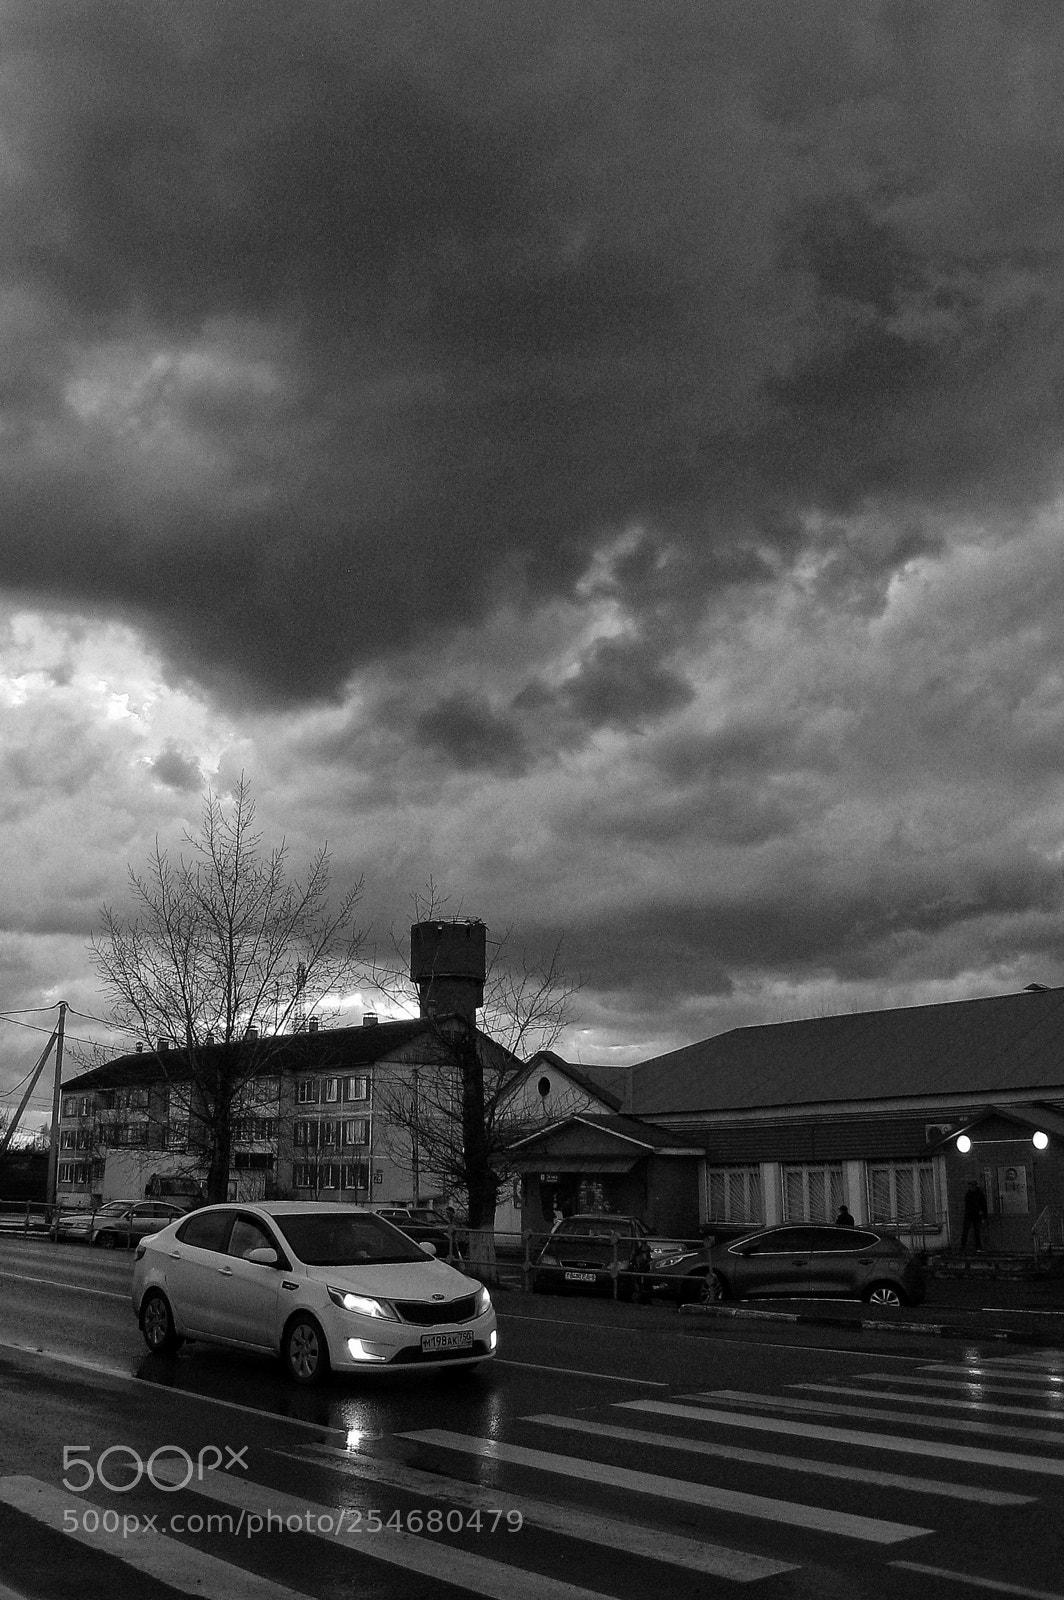 clouds, Canon DIGITAL IXUS 860 IS